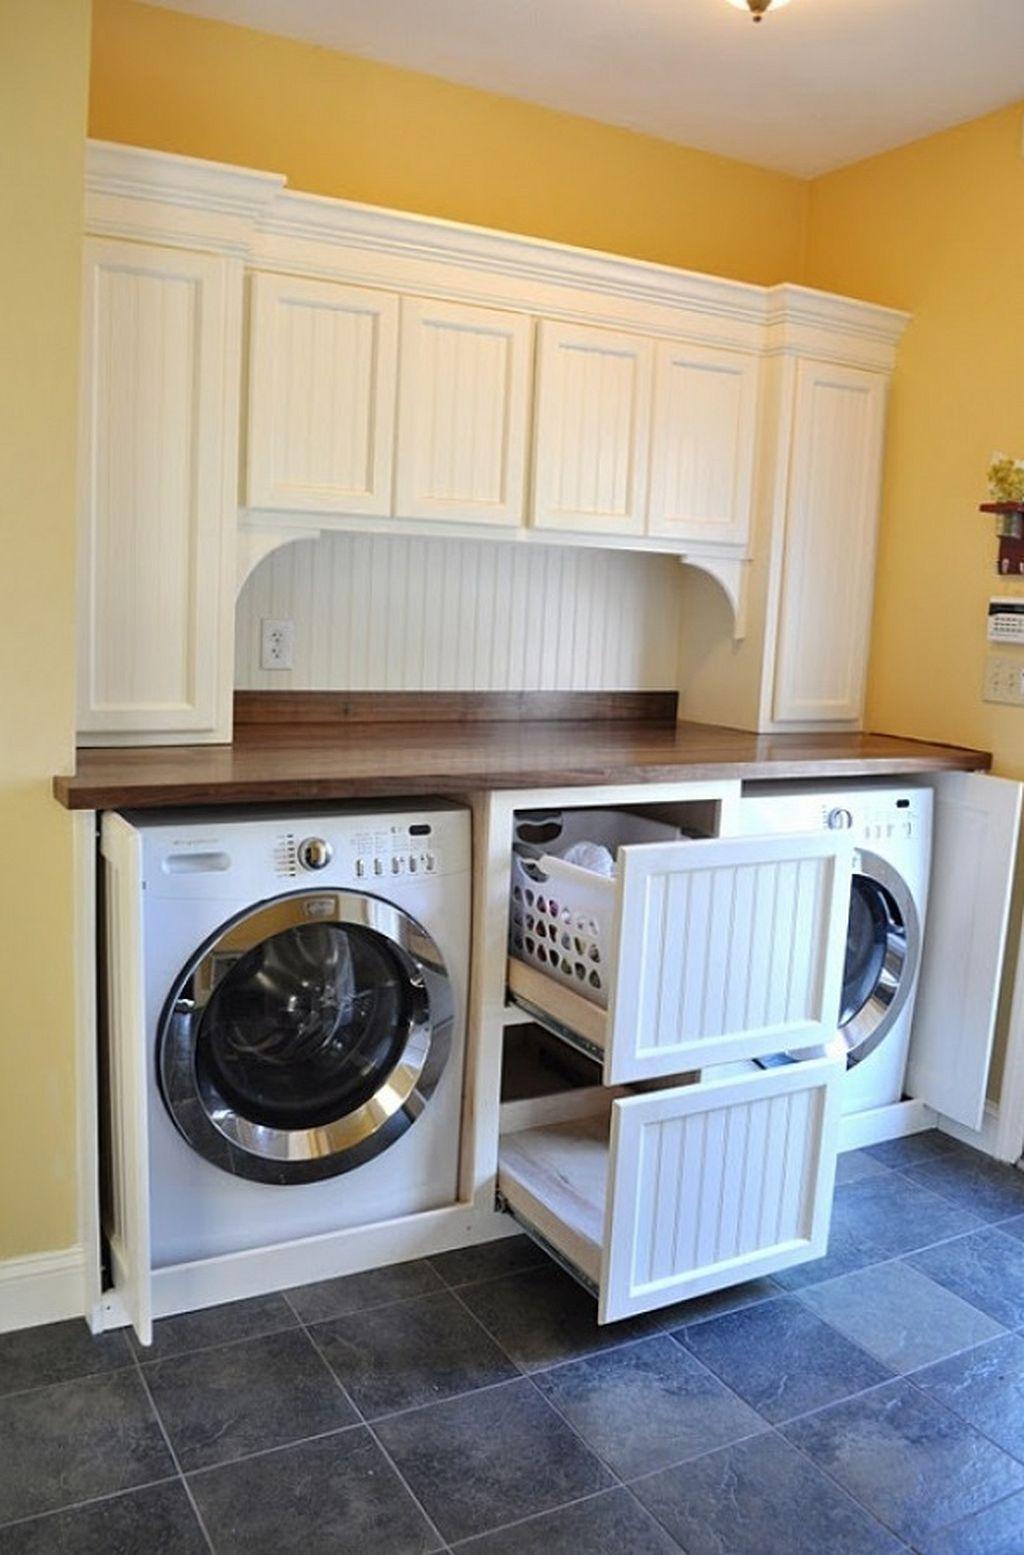 Amazing 146 Small Laundry Room Organization Ideas  Https://pinarchitecture.com/146 Small Laundry Room Organization Ideas/